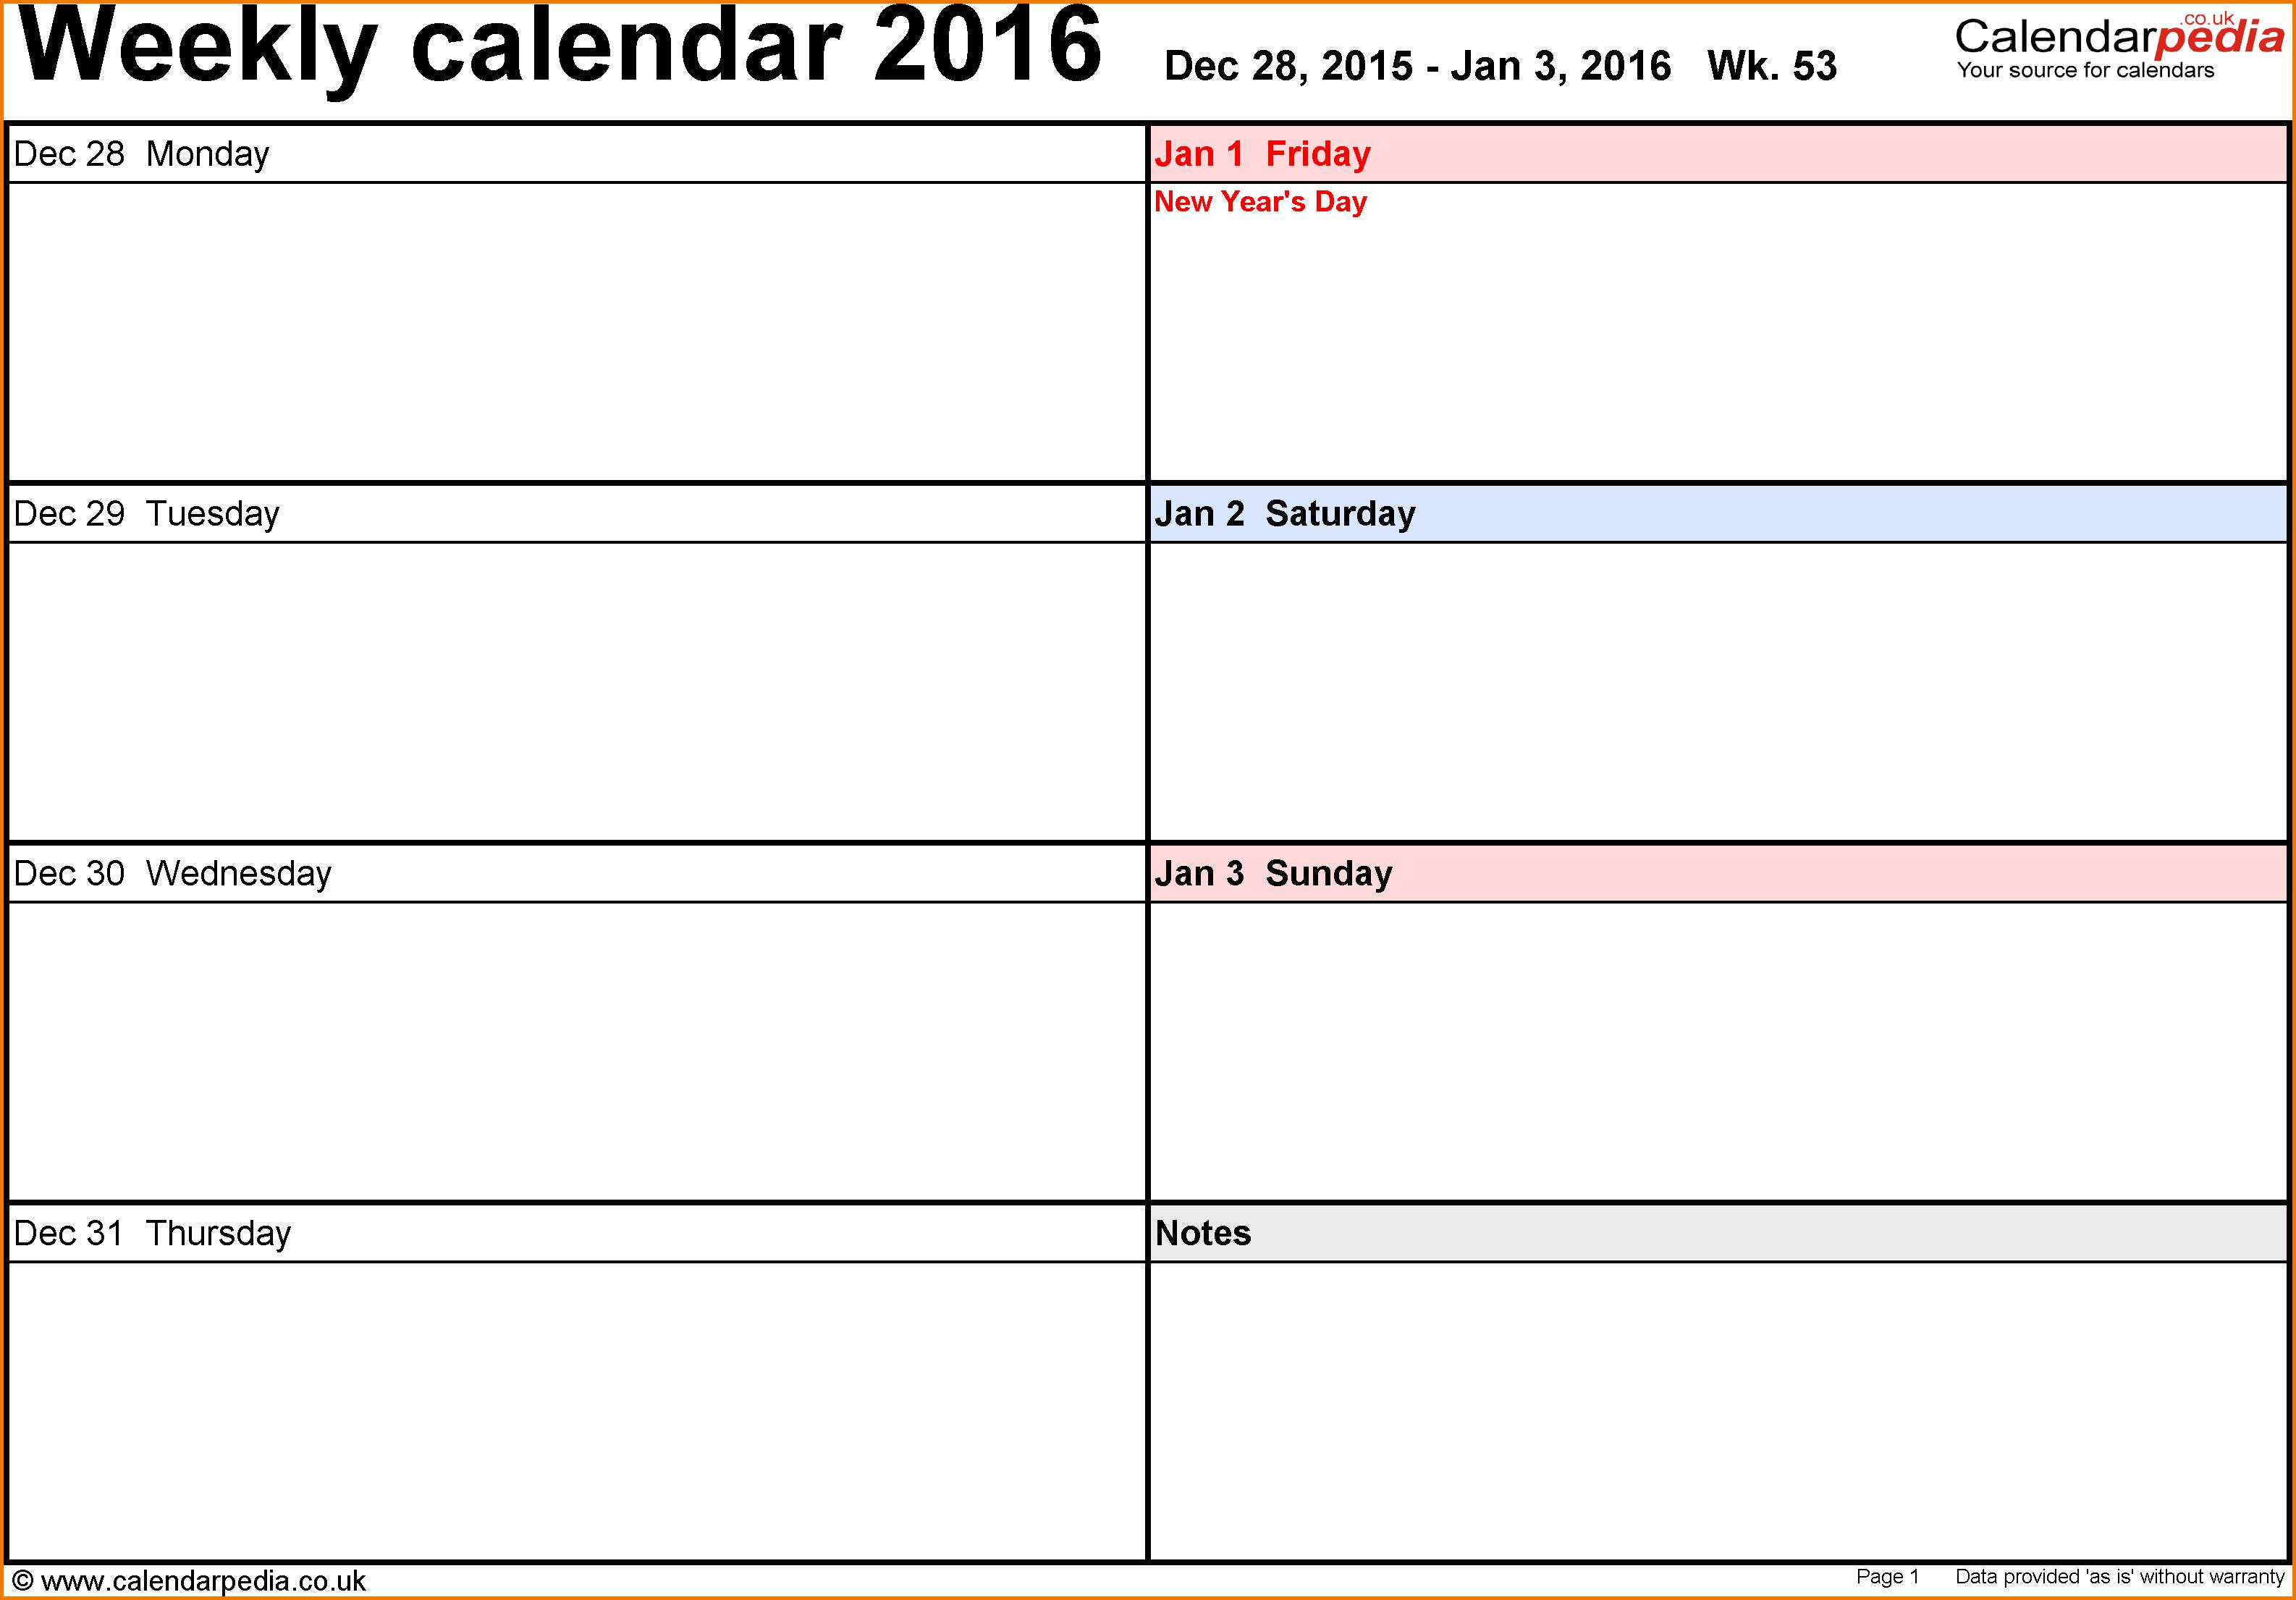 Excel Template 6 Weekly Calendar 2016 Landscape Orientation Days Daily Planner Template Weekly Planner Template Free Weekly Planner Templates